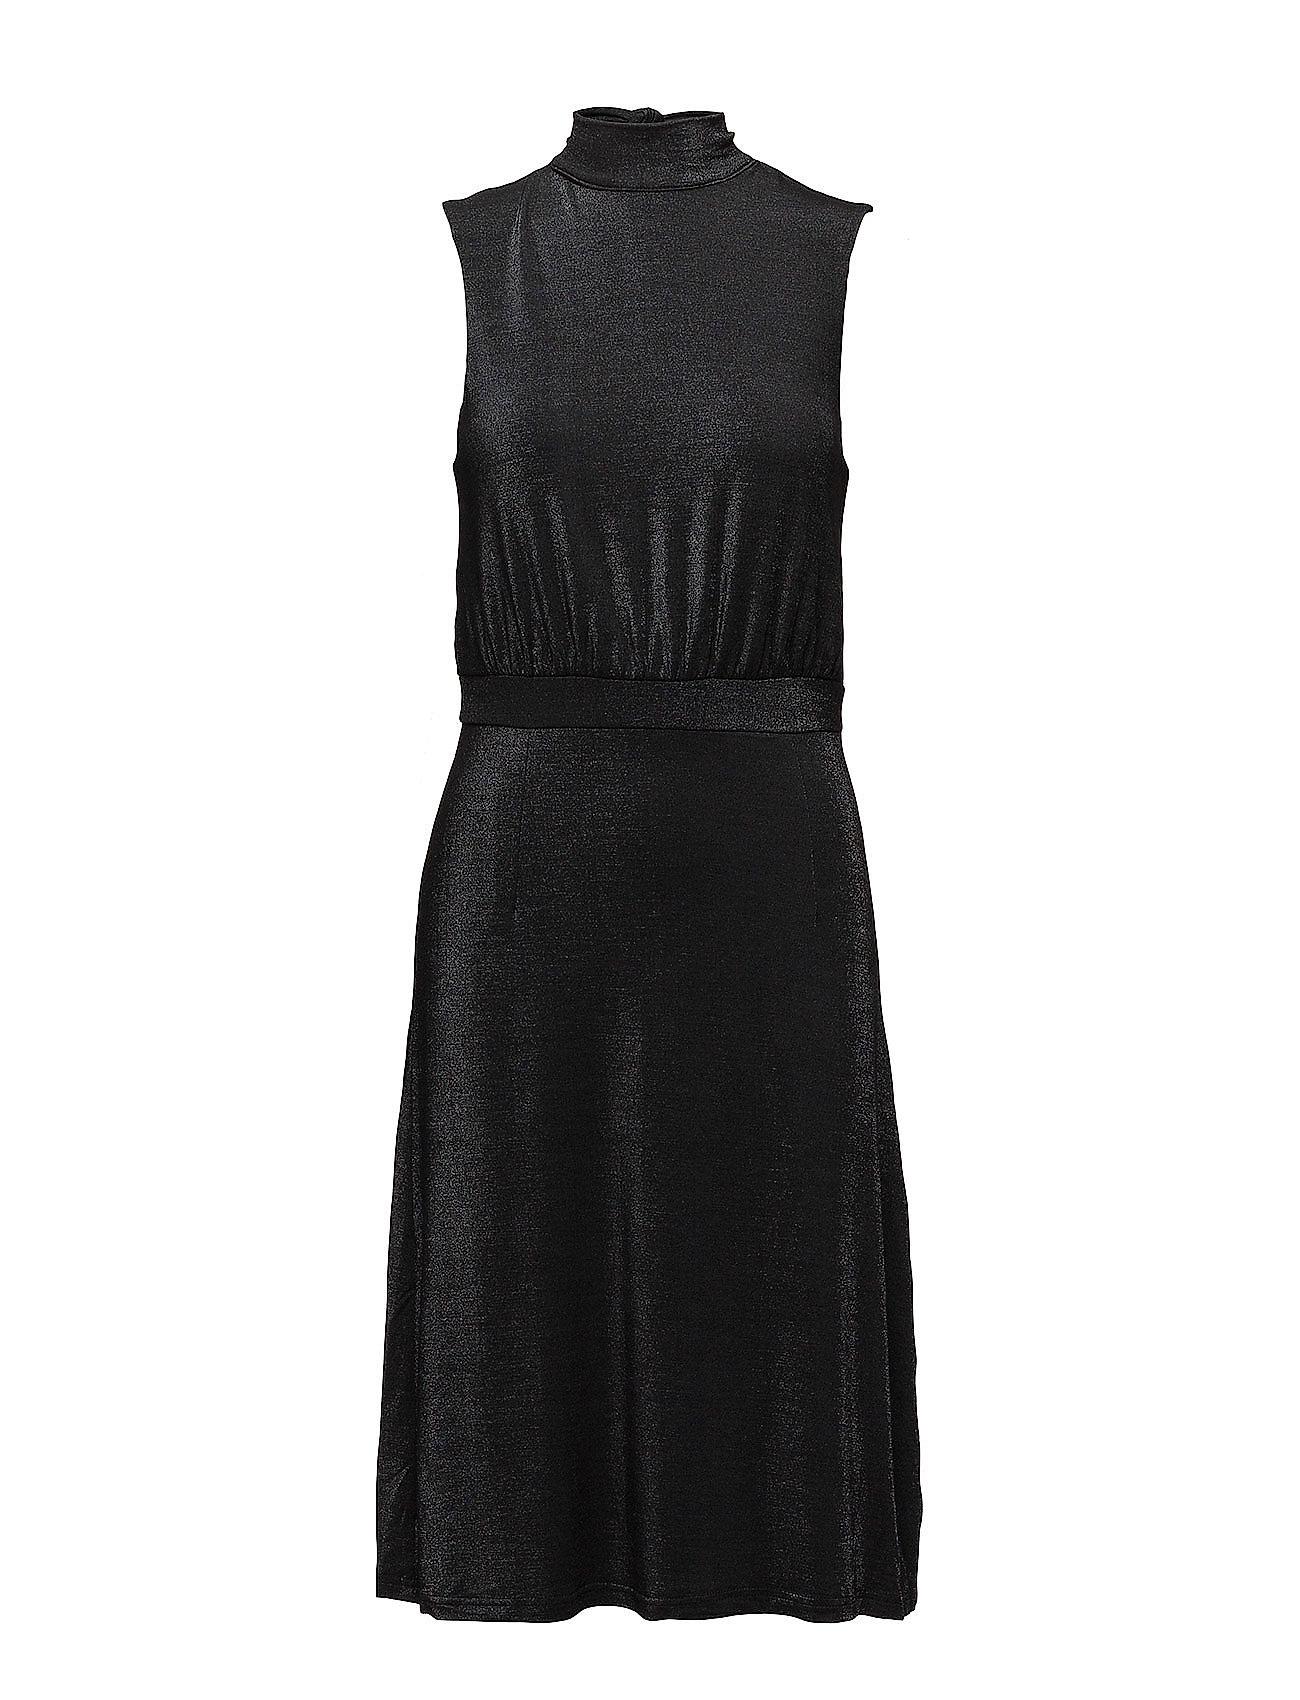 Selected Femme SFSTELLA SL DRESS - BLACK